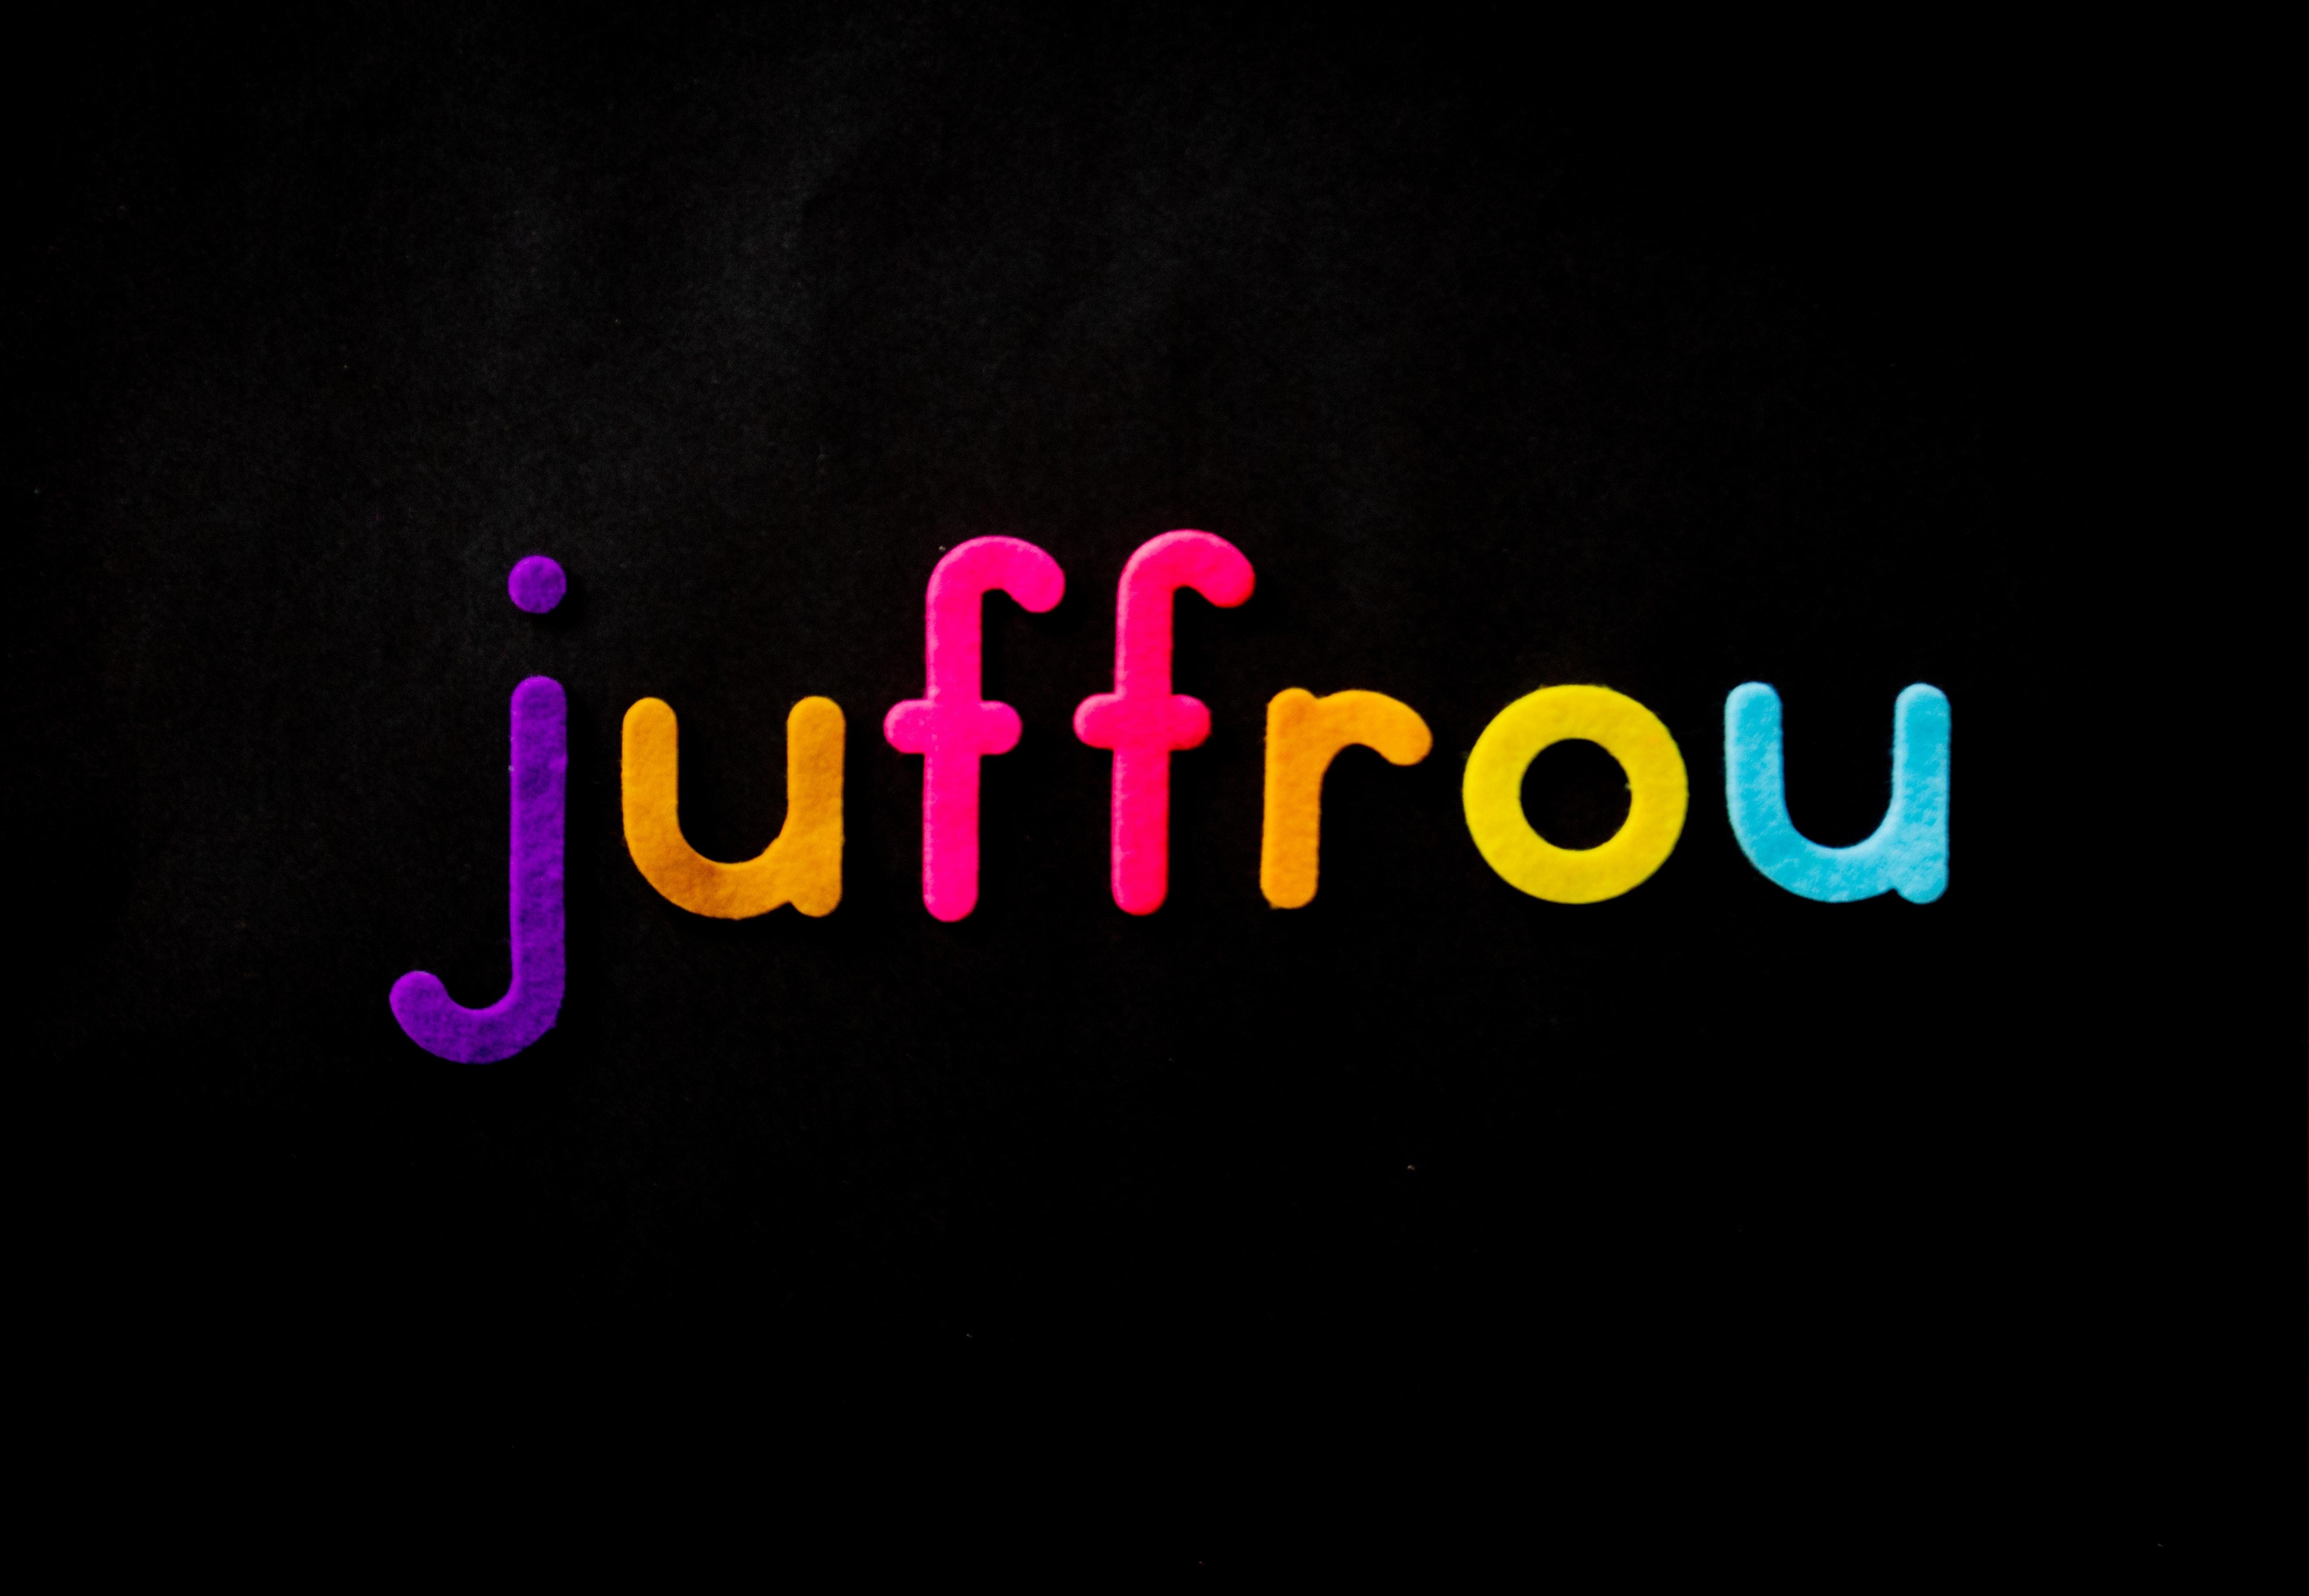 Download 720 Koleksi Background Hitam Kata-Kata Terbaik